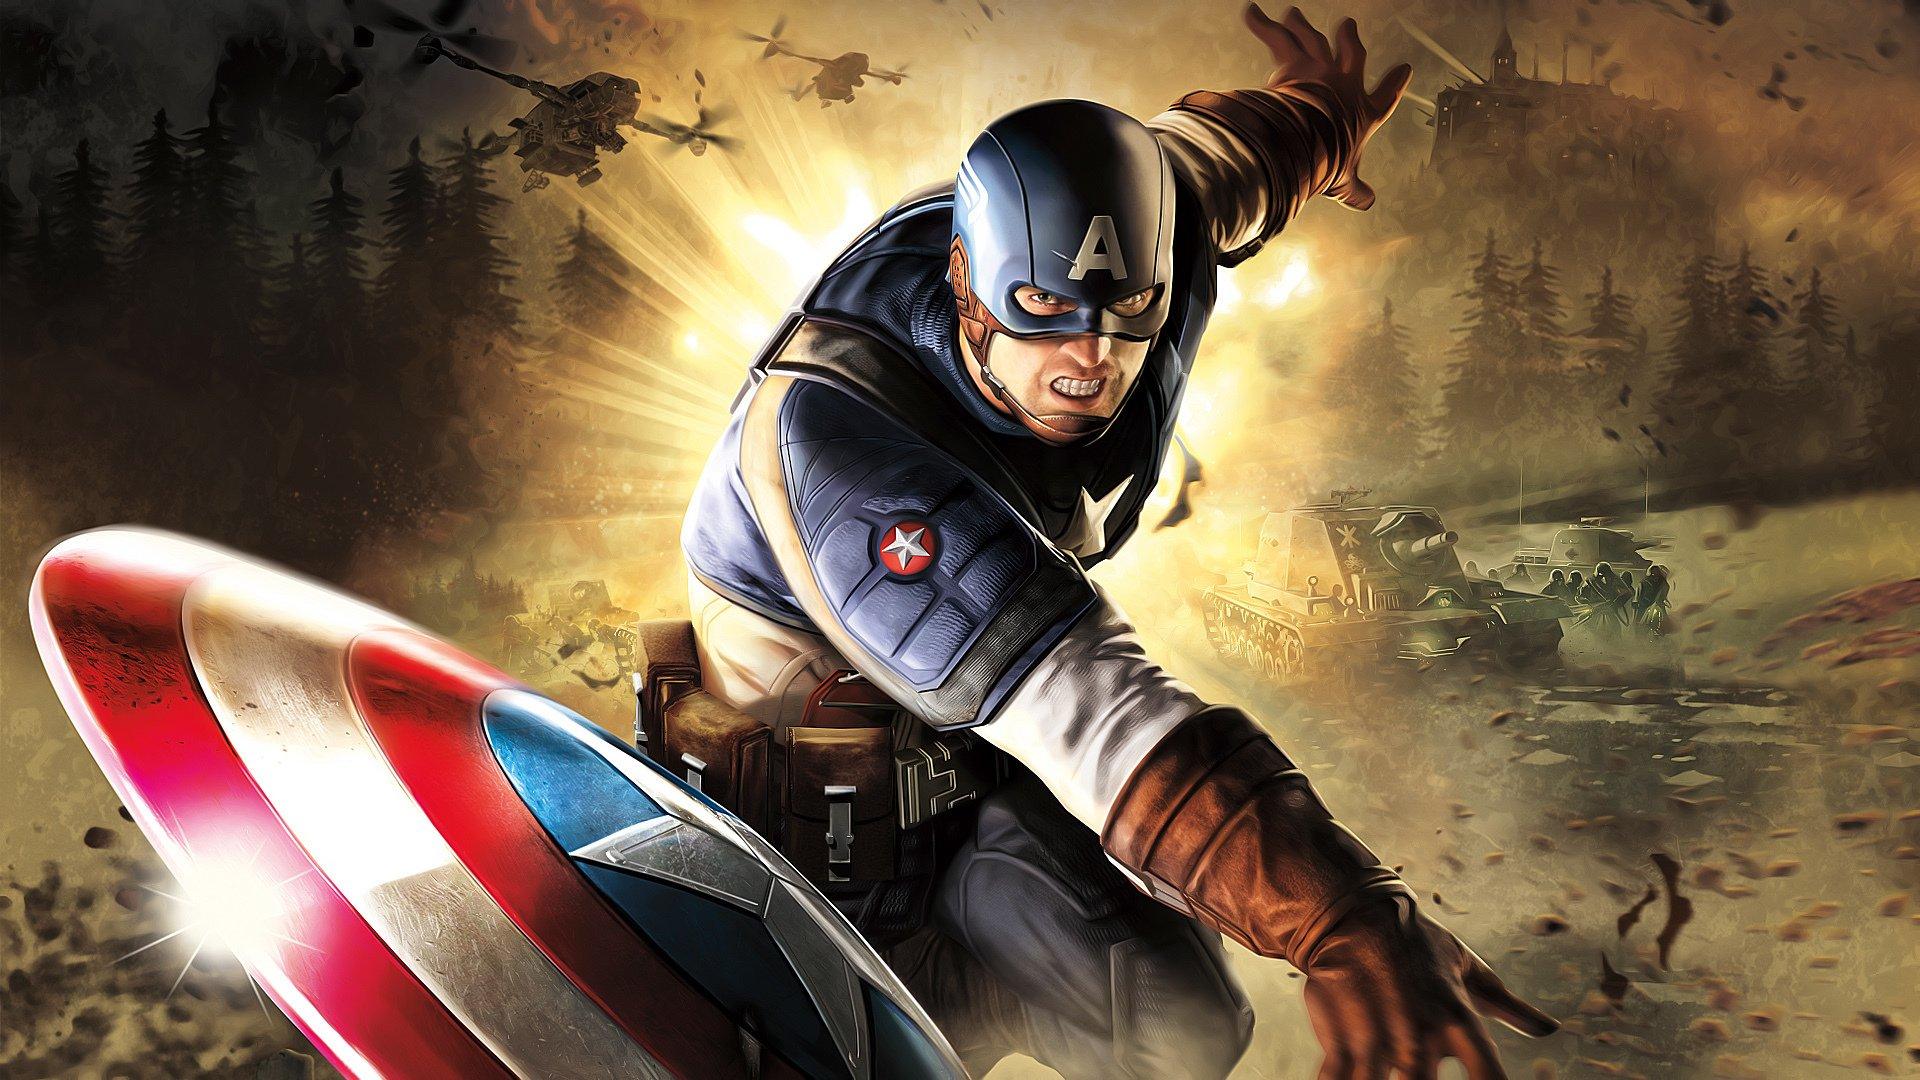 Captain America  C2 B7 Wallpapers Id211685